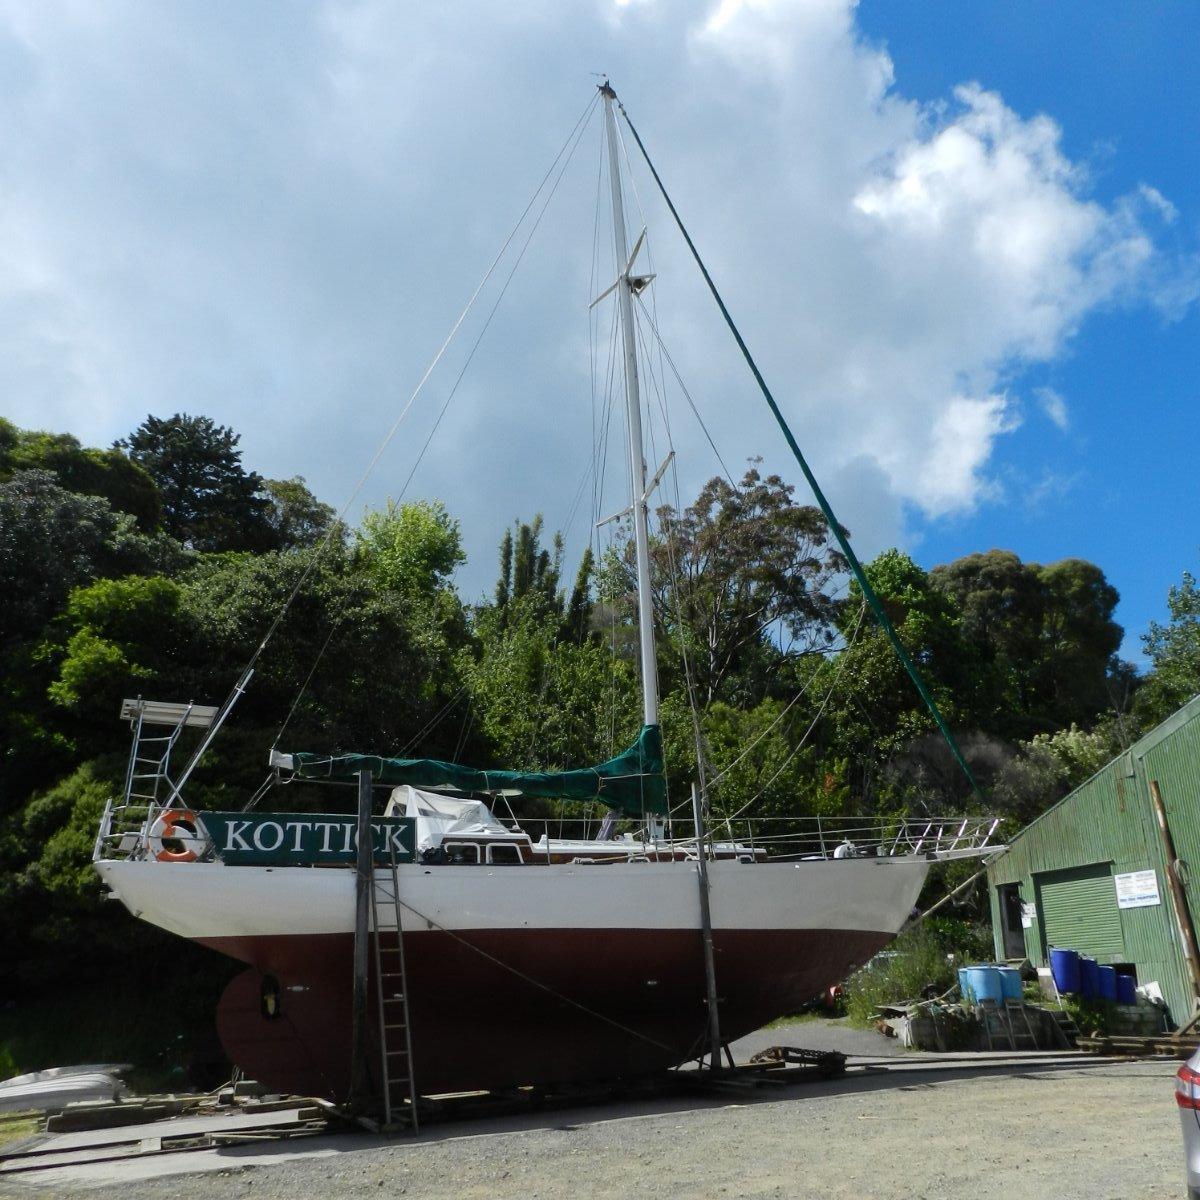 Classic steel cruising yacht